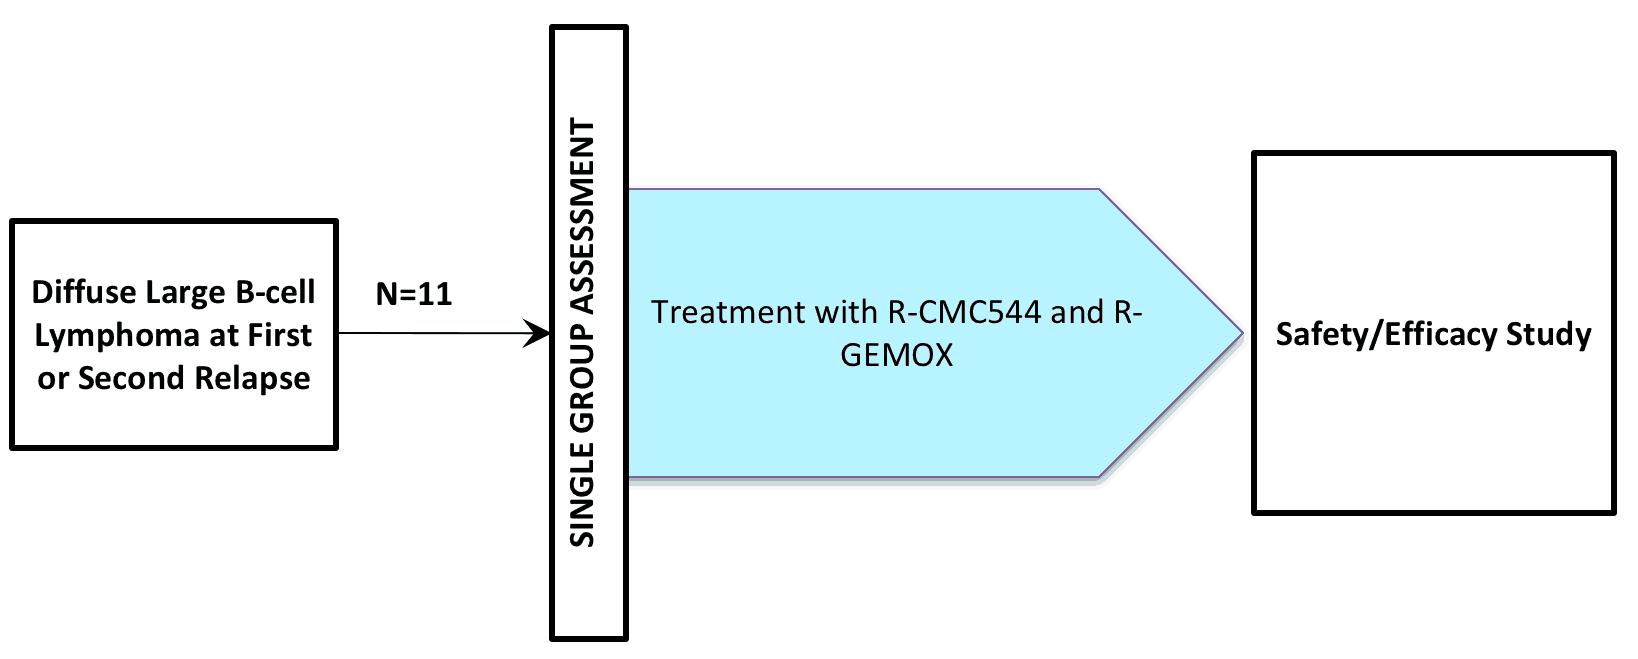 NCT01562990 (CLINICAL TRIAL / INOTUZUMAB OZOGAMYCIN / CMC-544)